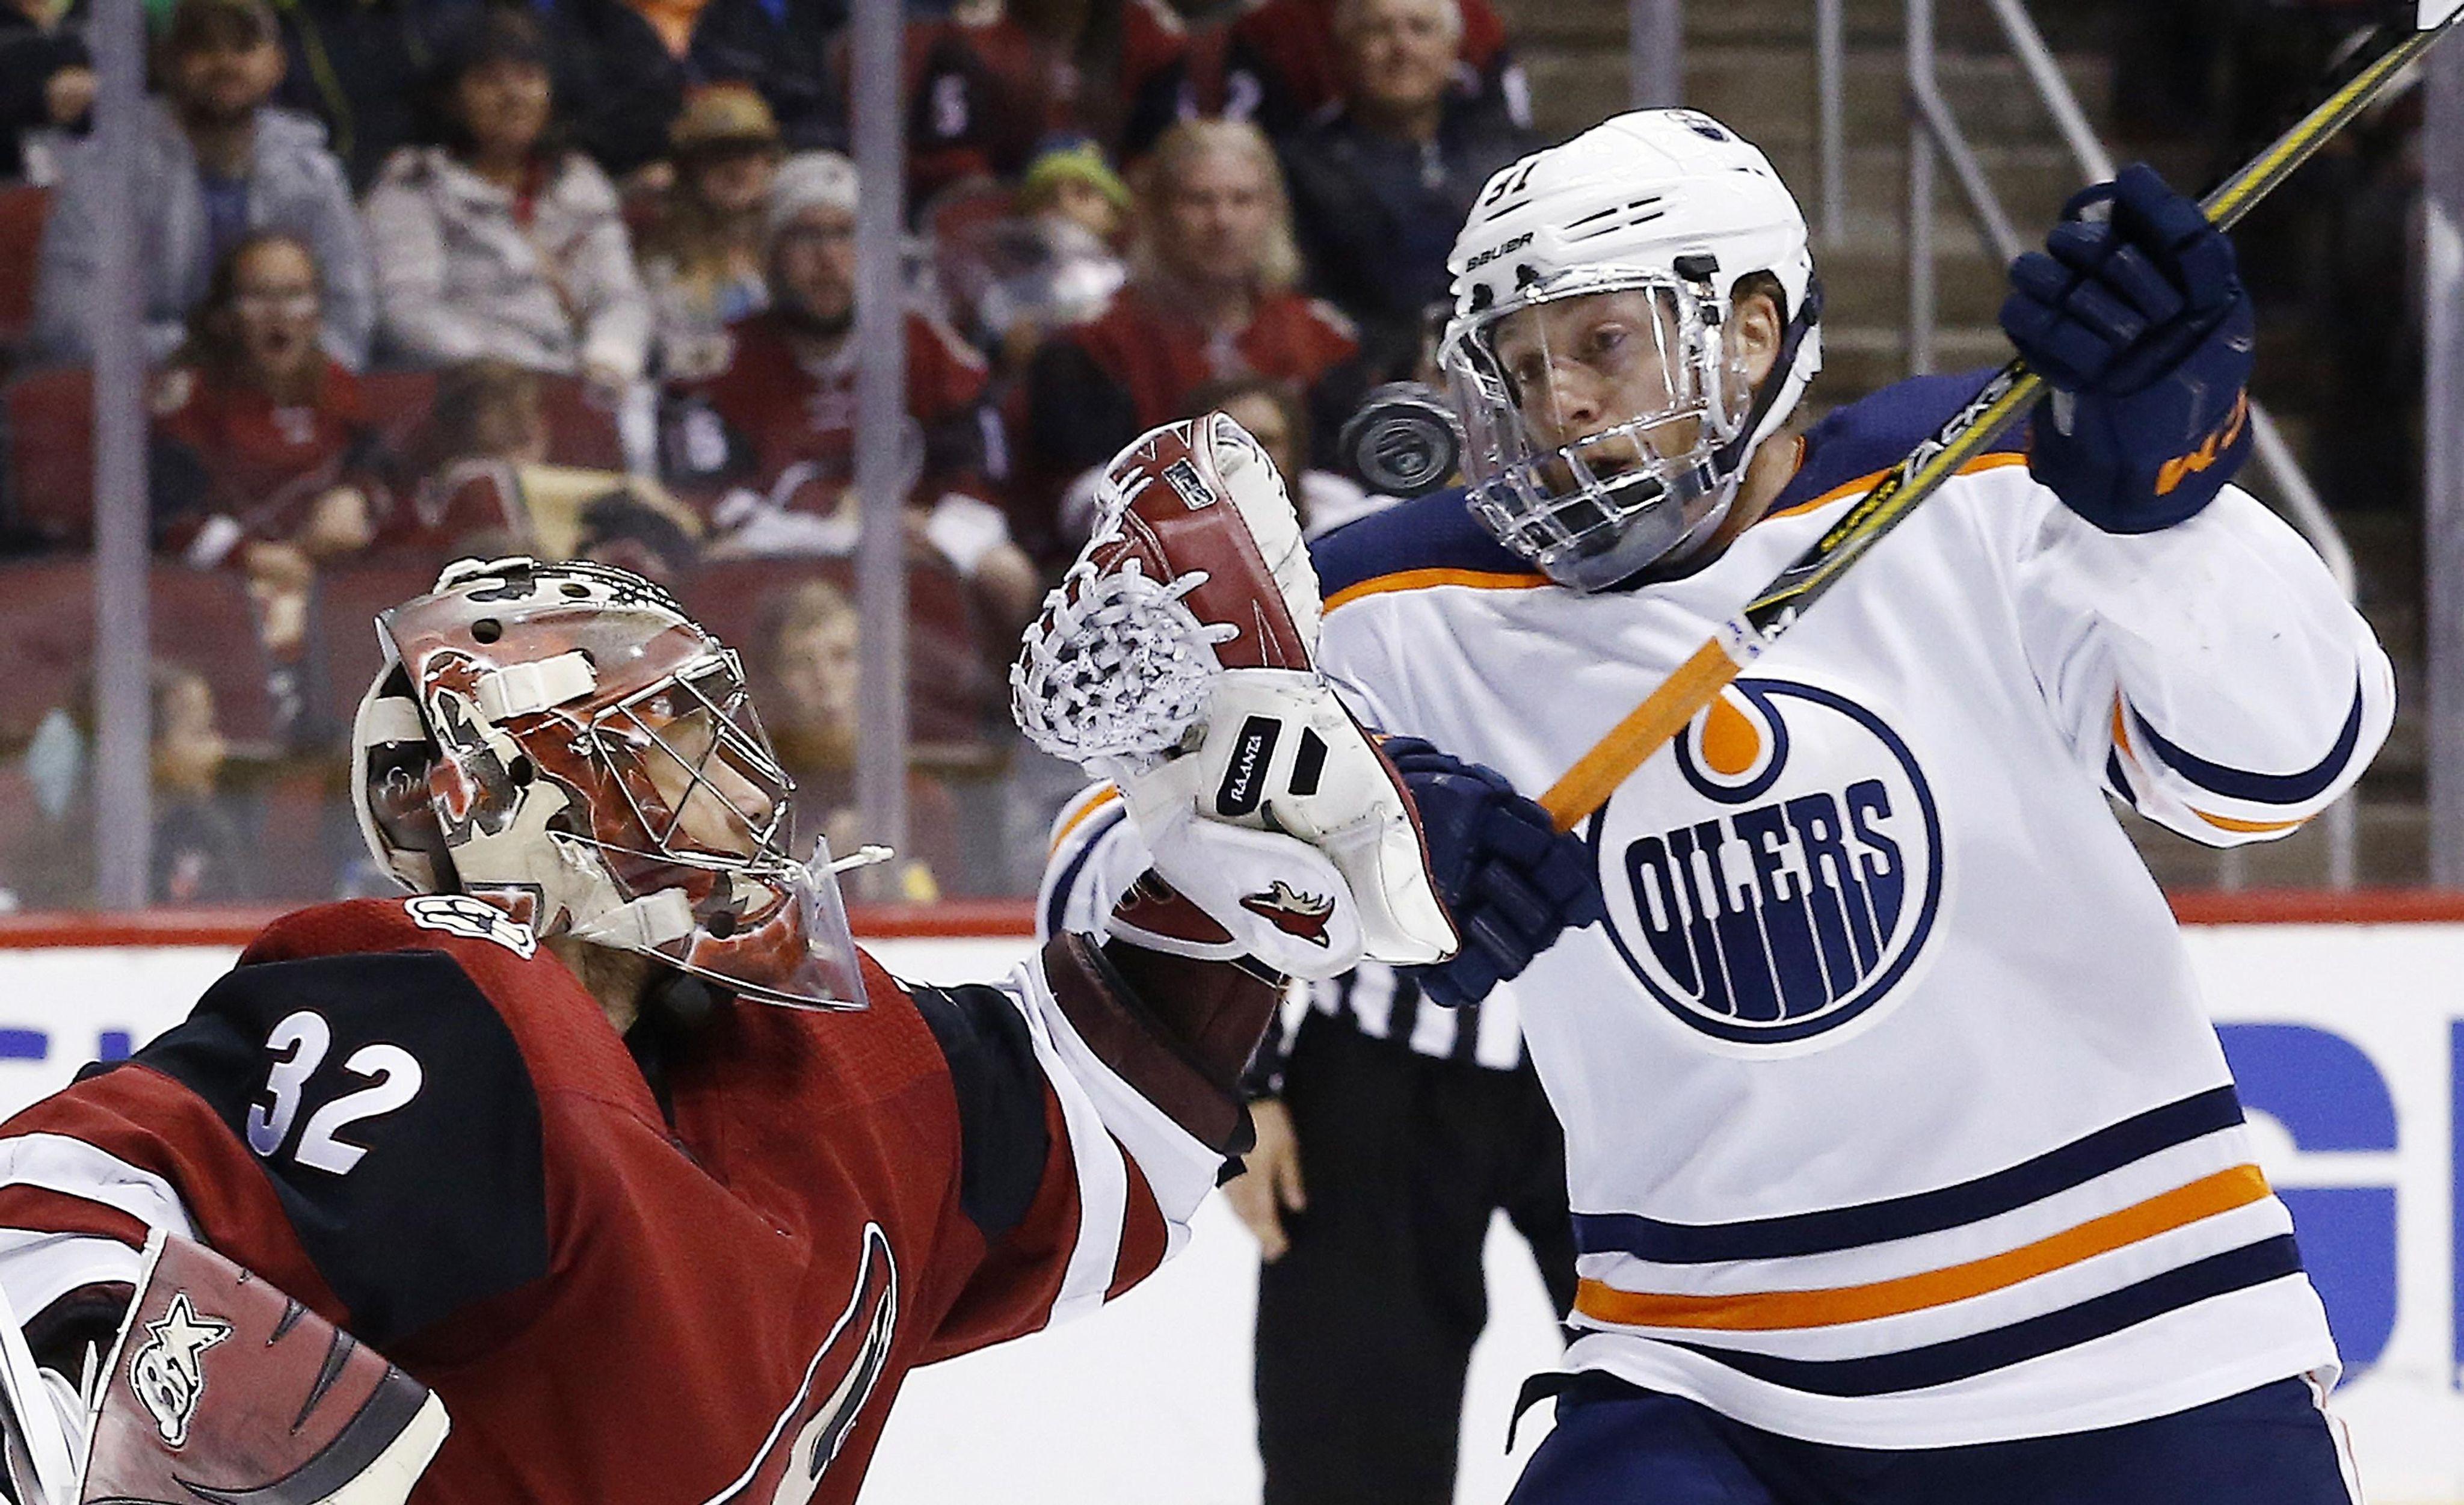 Oilers_coyotes_hockey_62192_s4096x2502